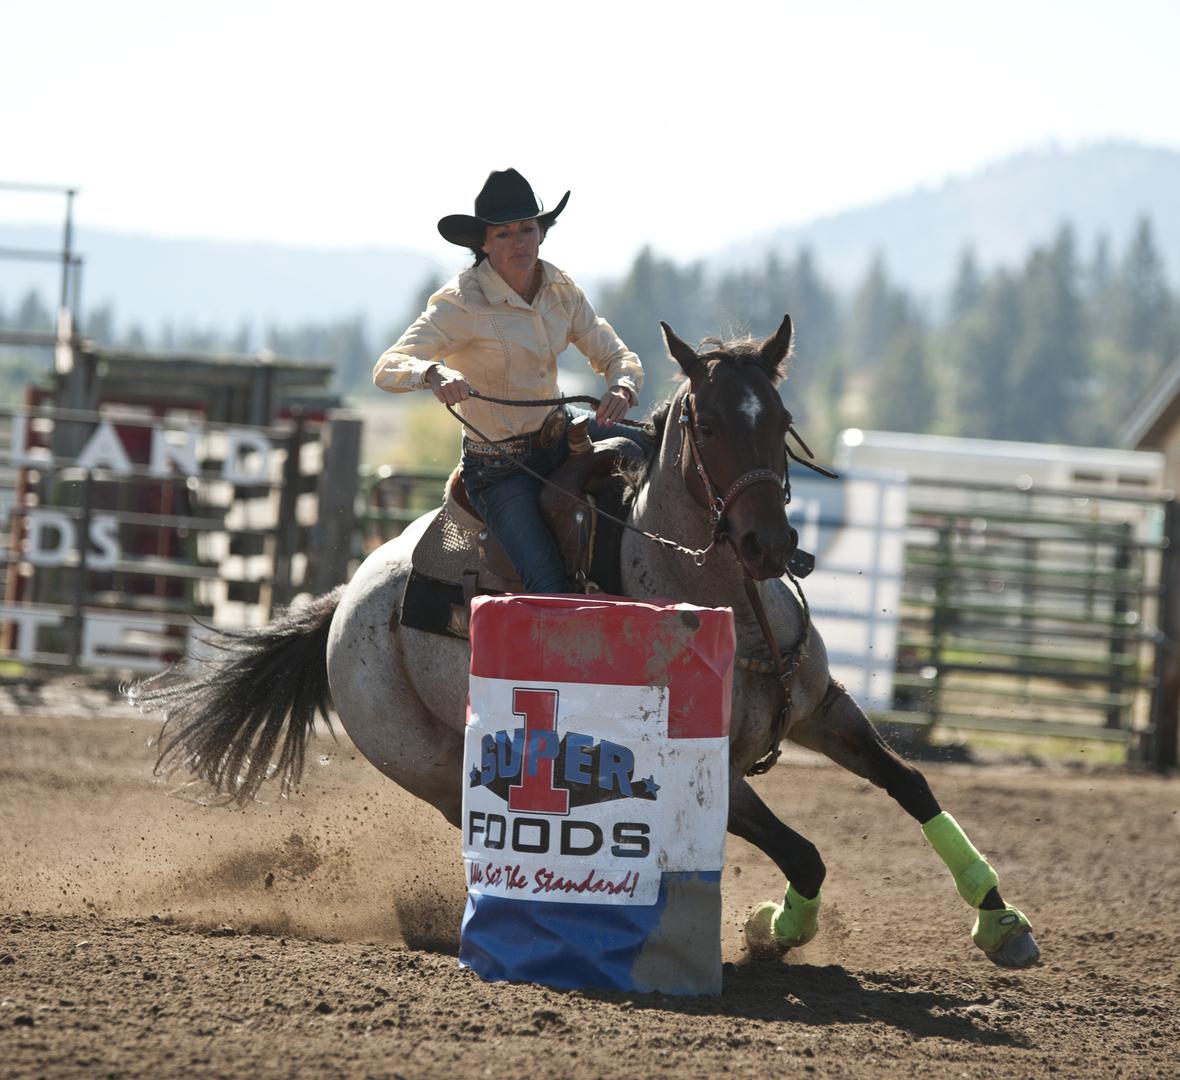 rodeo rider and horse running around barrel